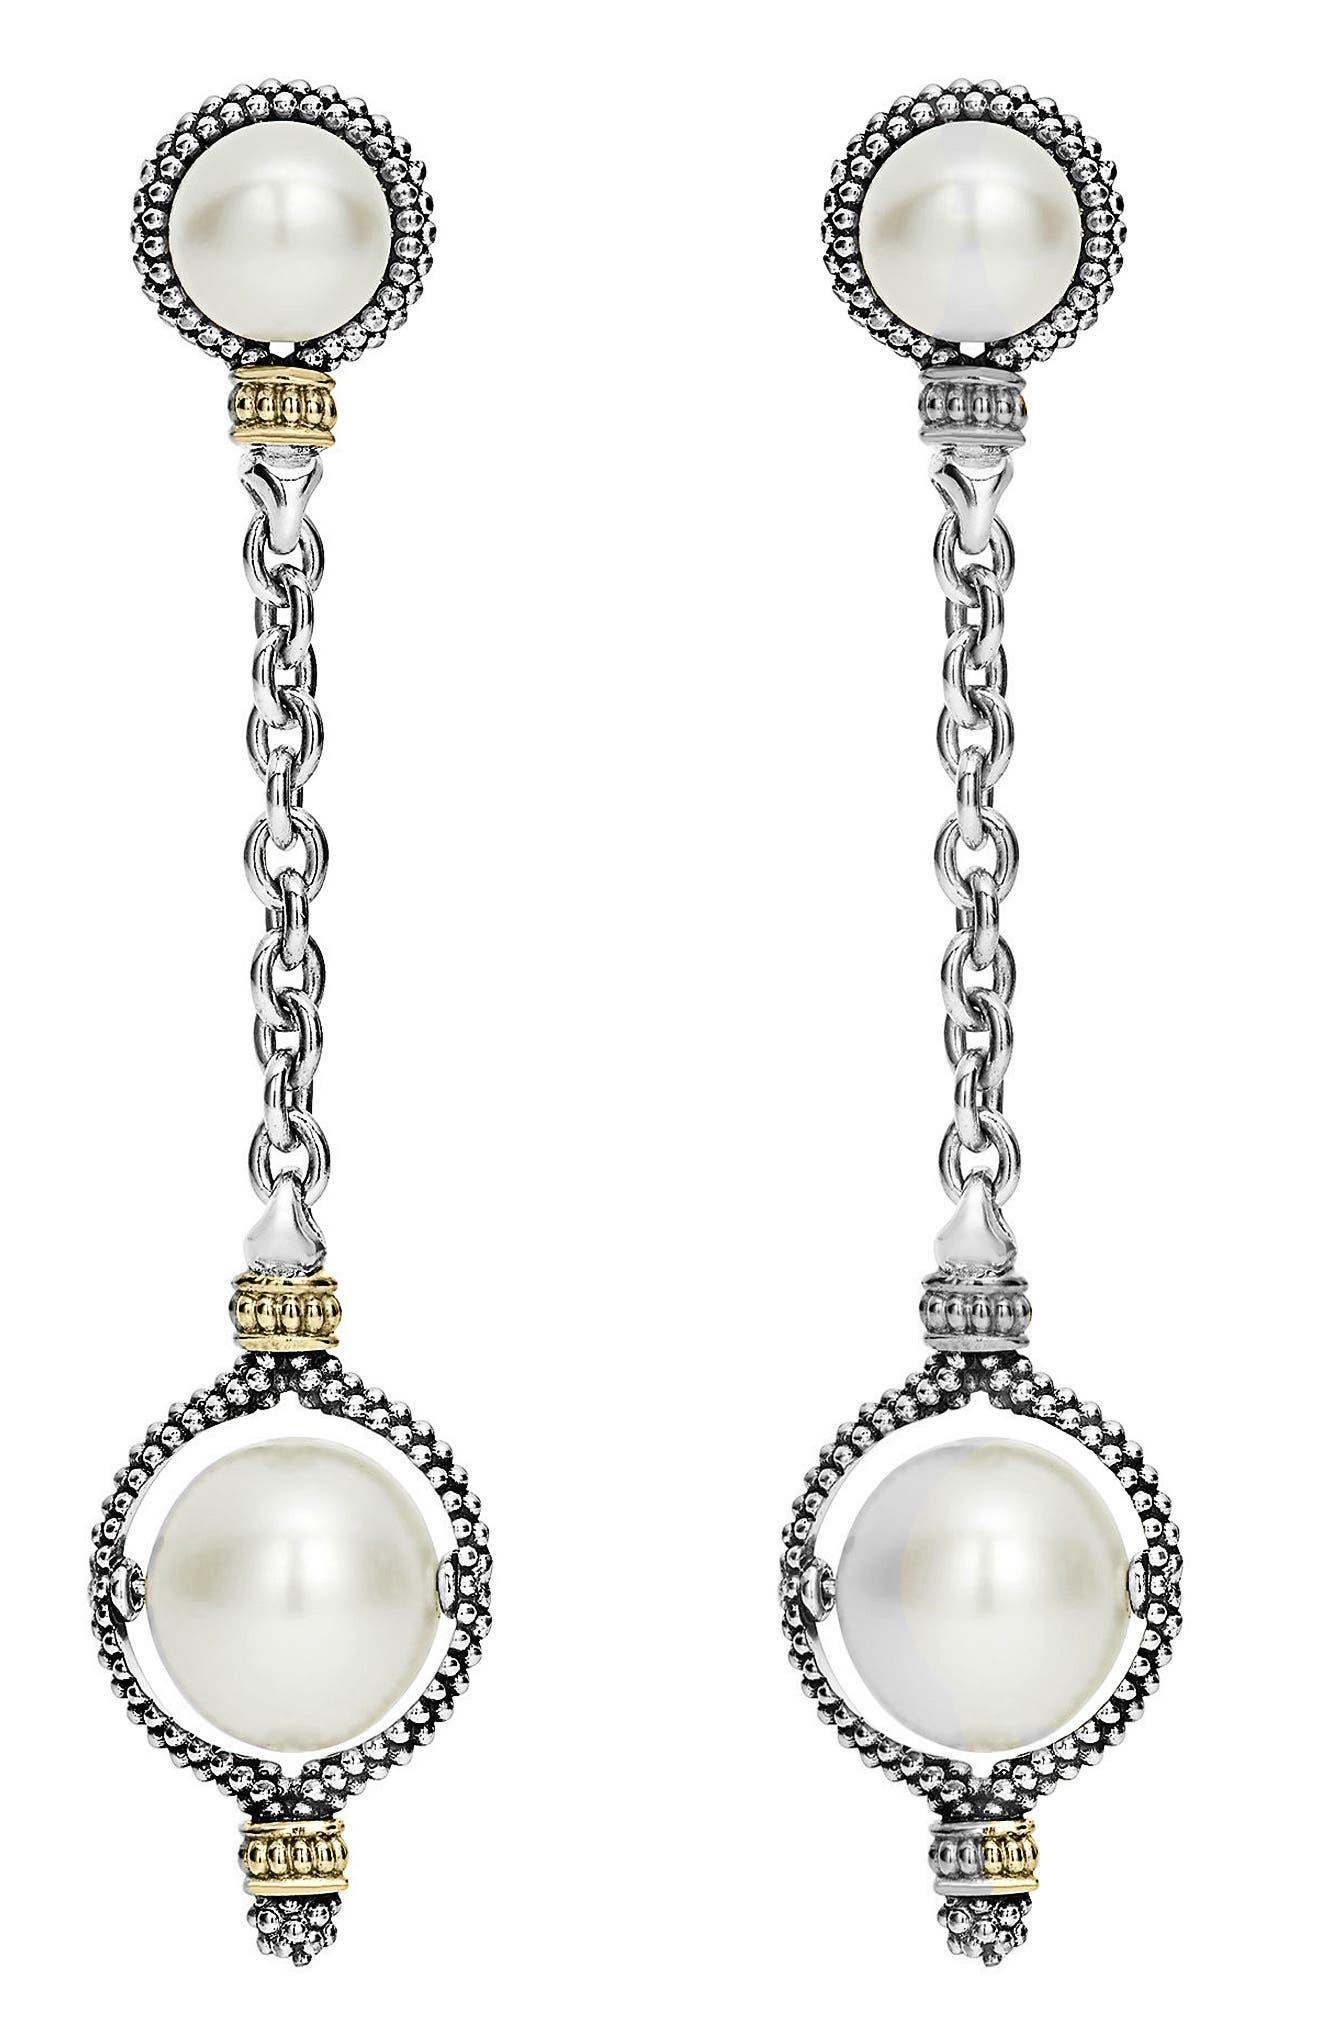 Luna Pearl Drop Earrings,                             Alternate thumbnail 2, color,                             SILVER/ PEARL